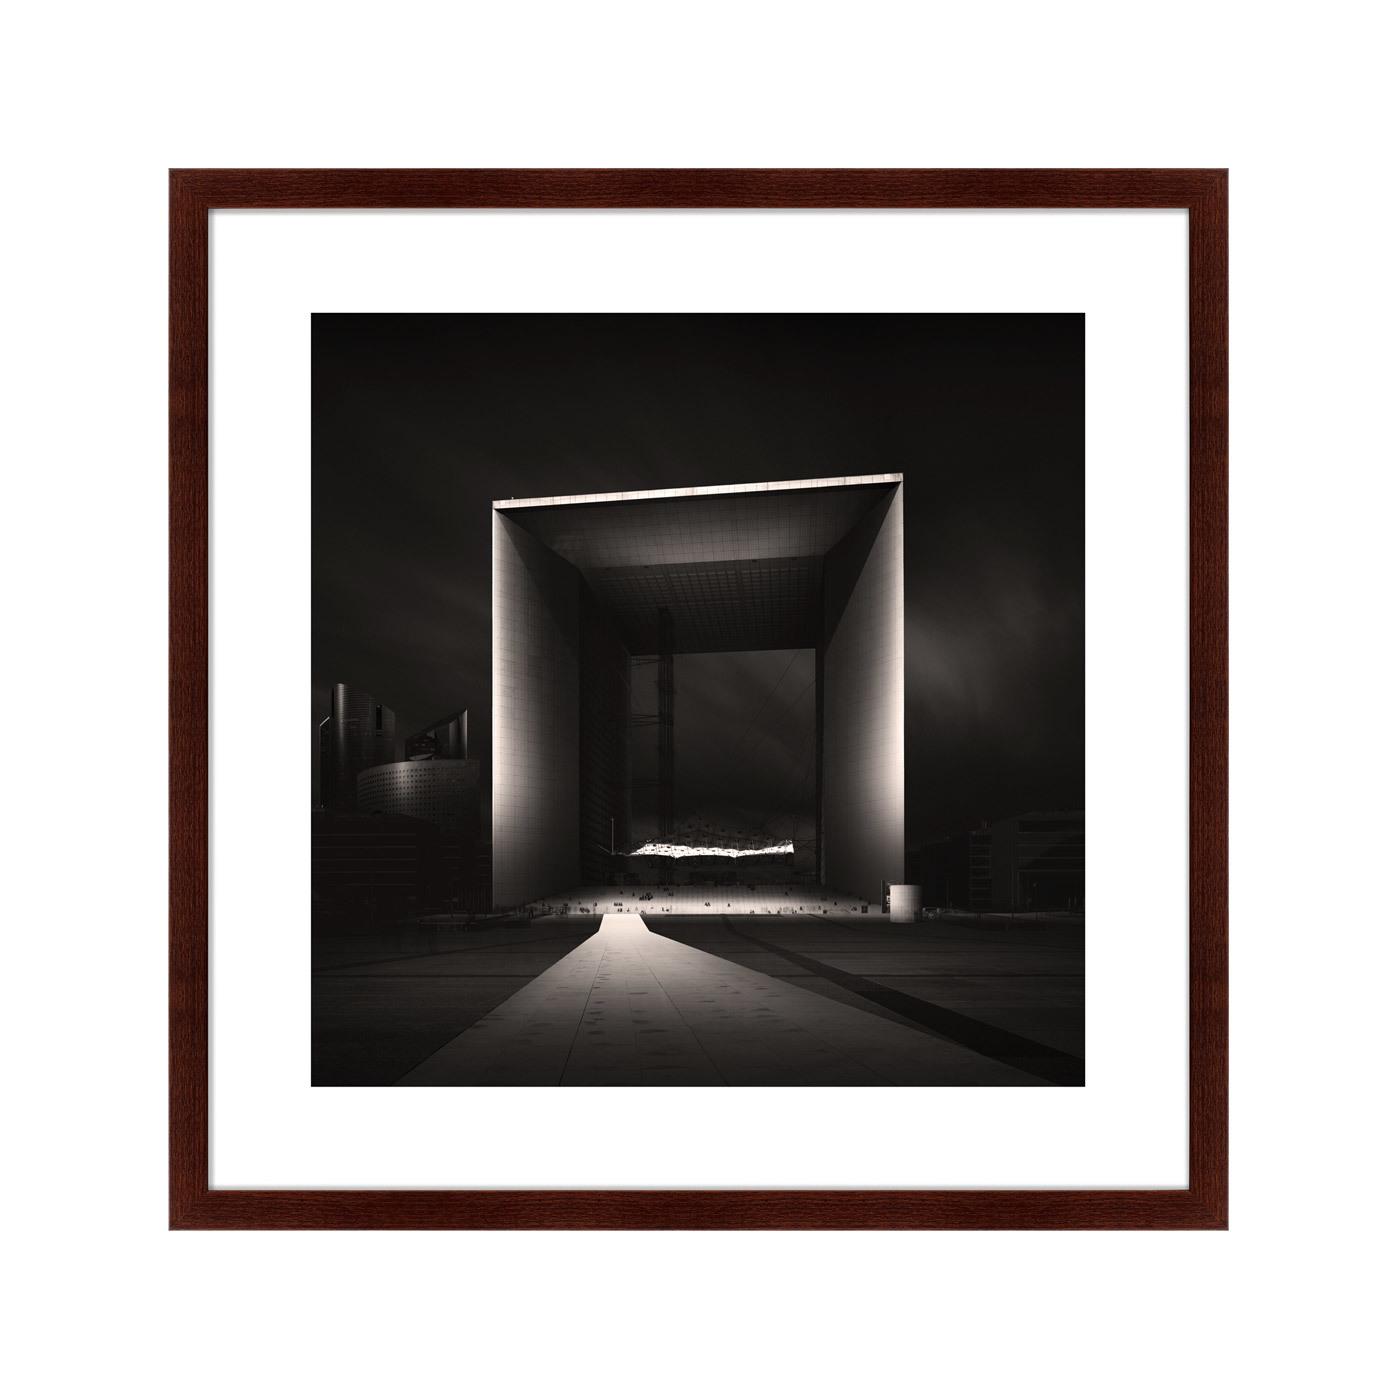 {} Картины в Квартиру Картина Black square №1 (79х79 см) картины в квартиру картина sun beams 79х79 см